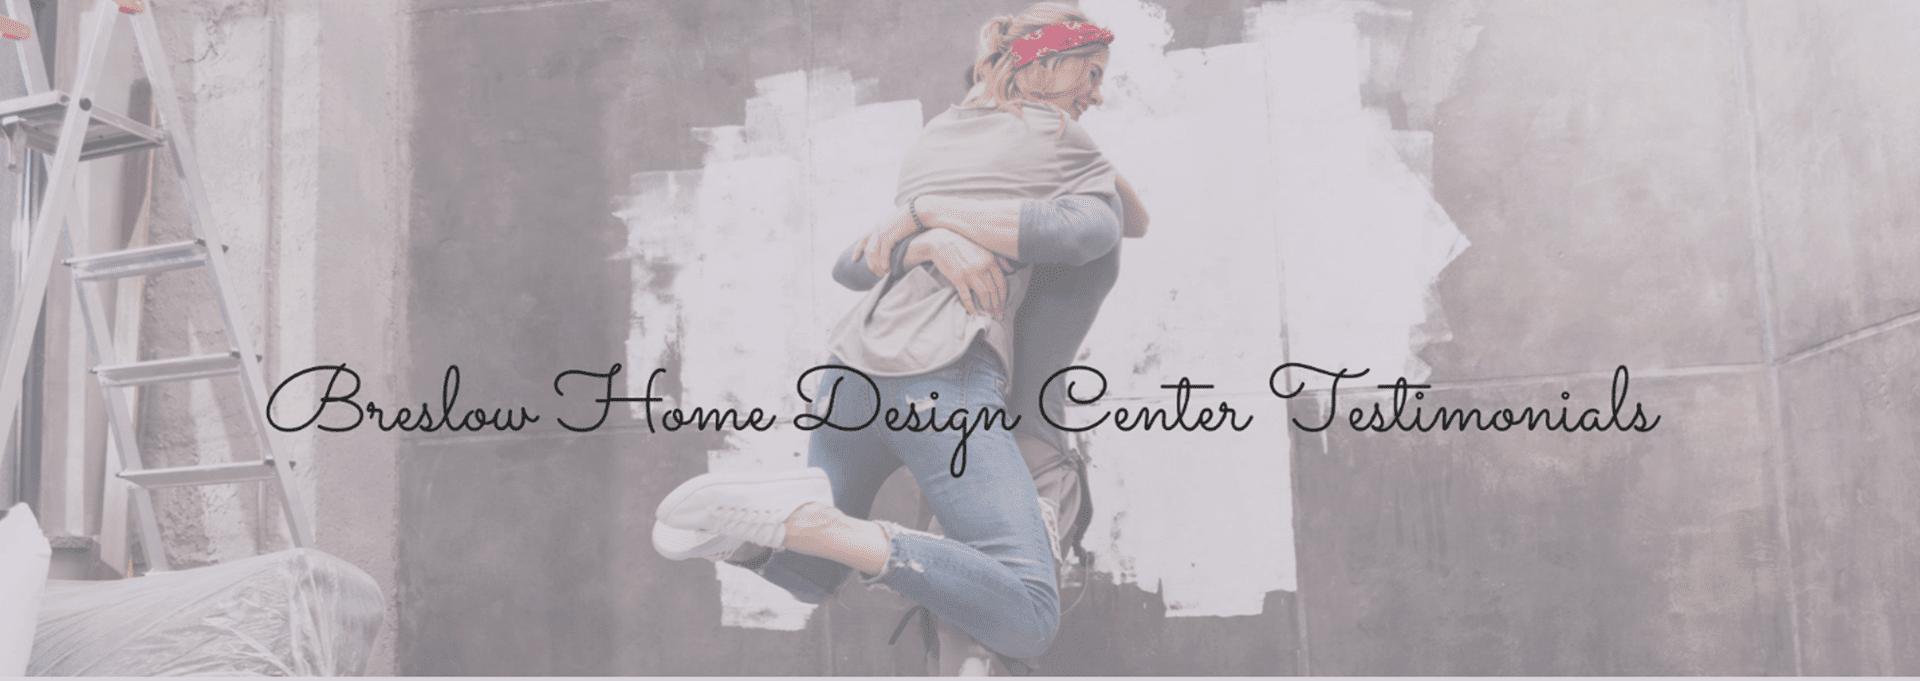 Breslow Home Design Center Testimonials